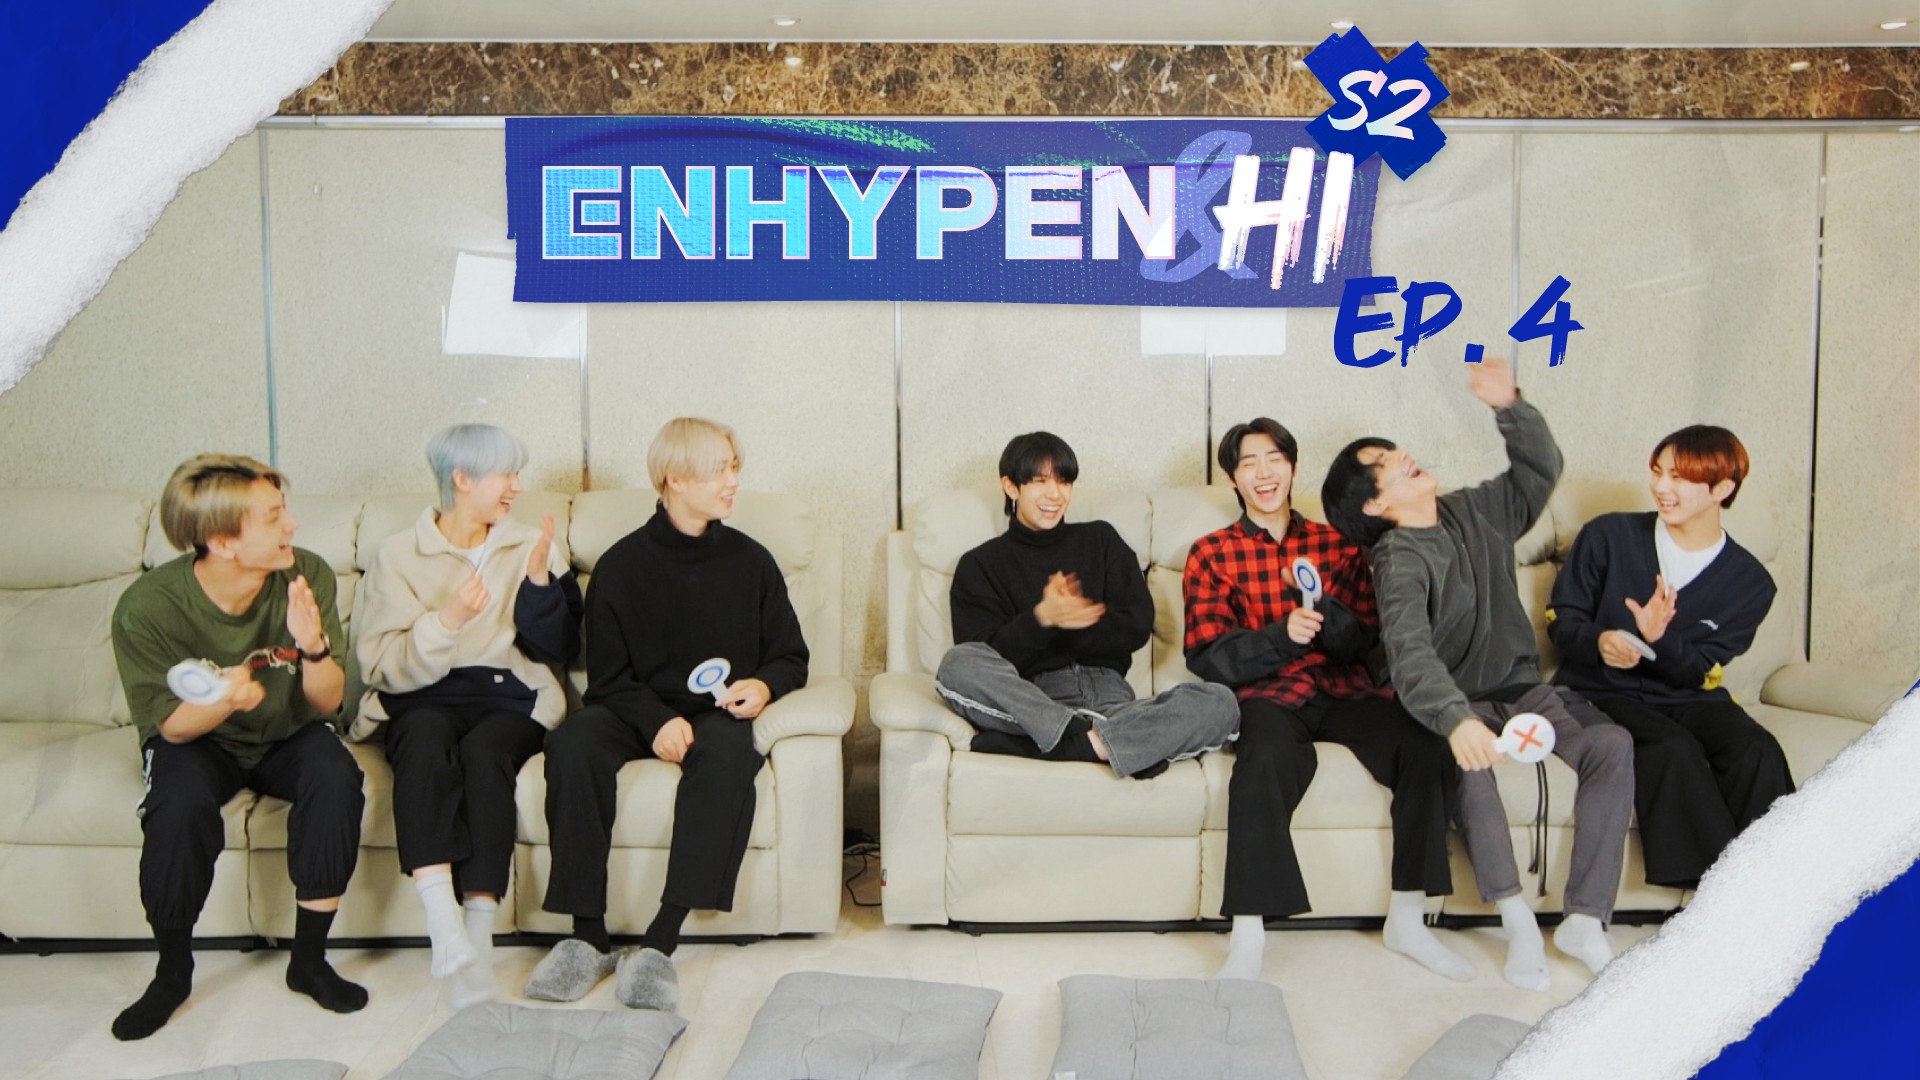 ENHYPEN (엔하이픈) 'ENHYPEN&Hi' Season 2 EP.4